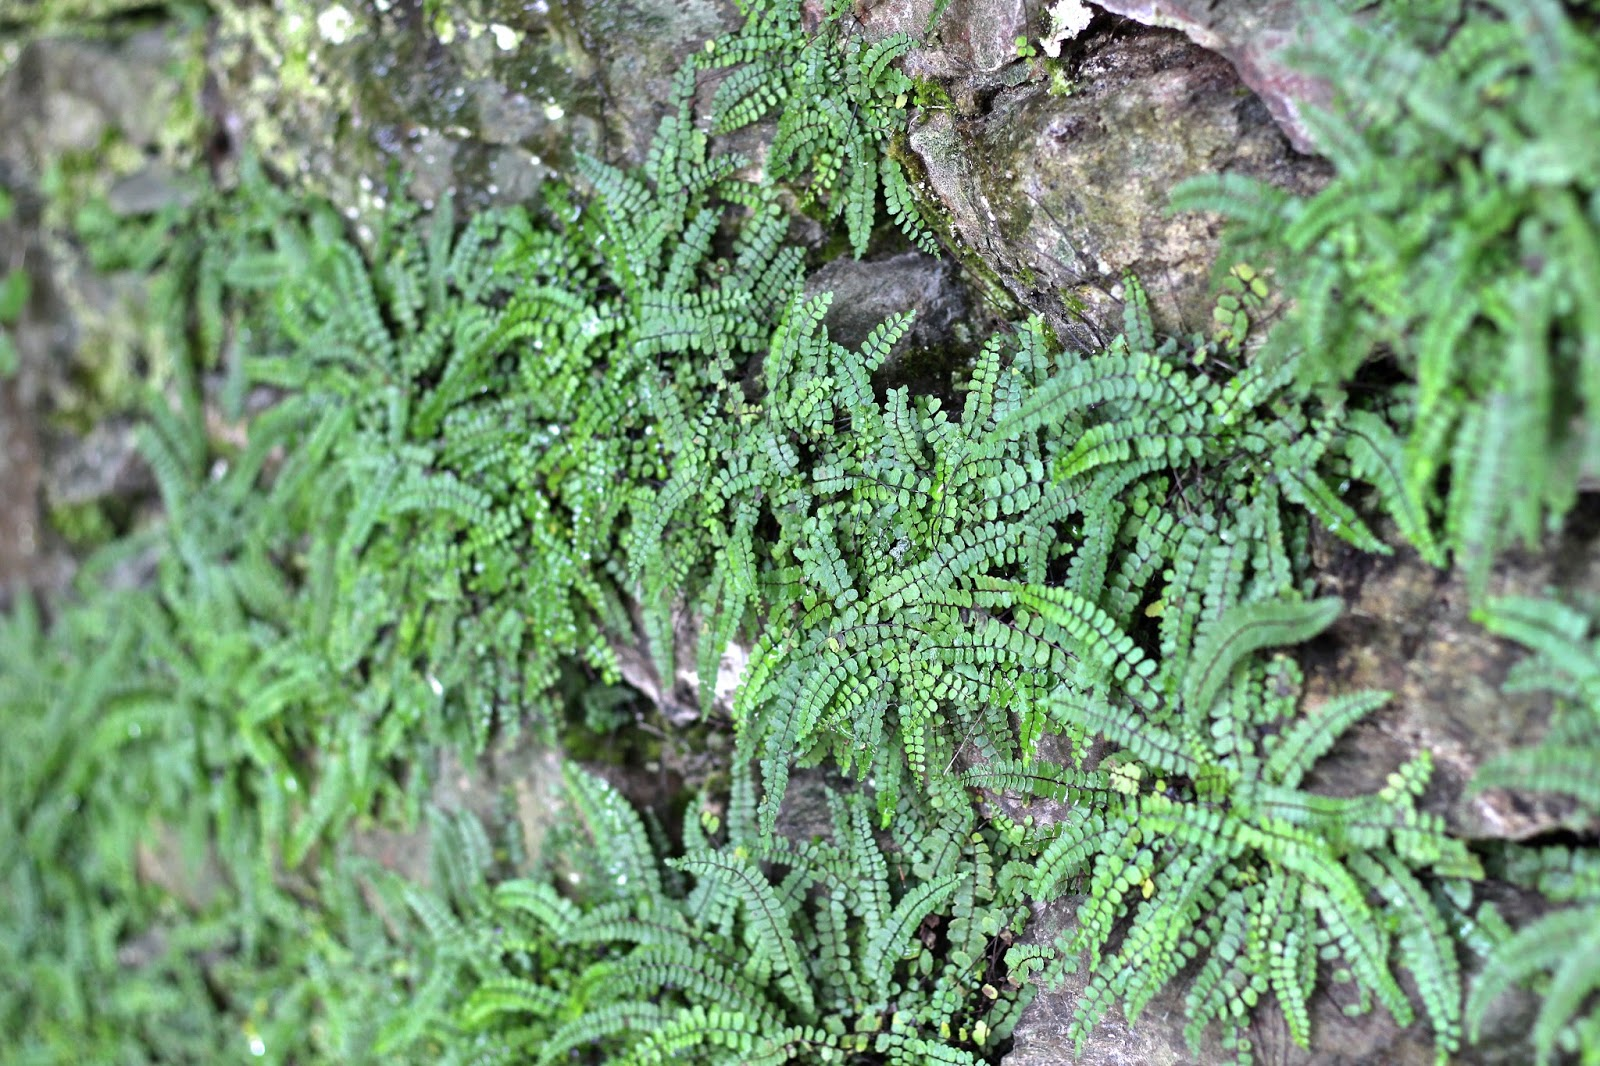 Wall of lush green ferns